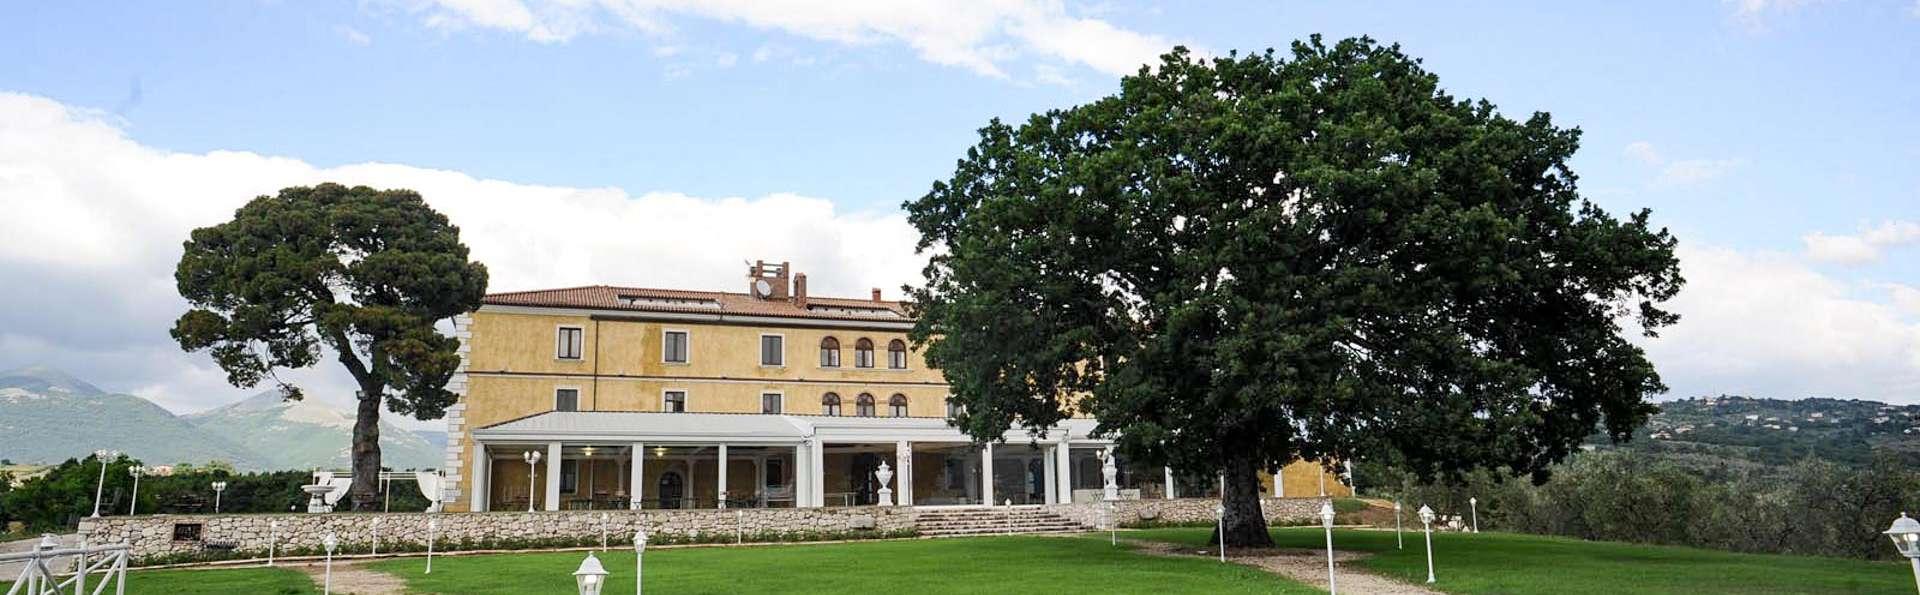 Eliceto Resort & Spa - EDIT_FRONT_01.jpg